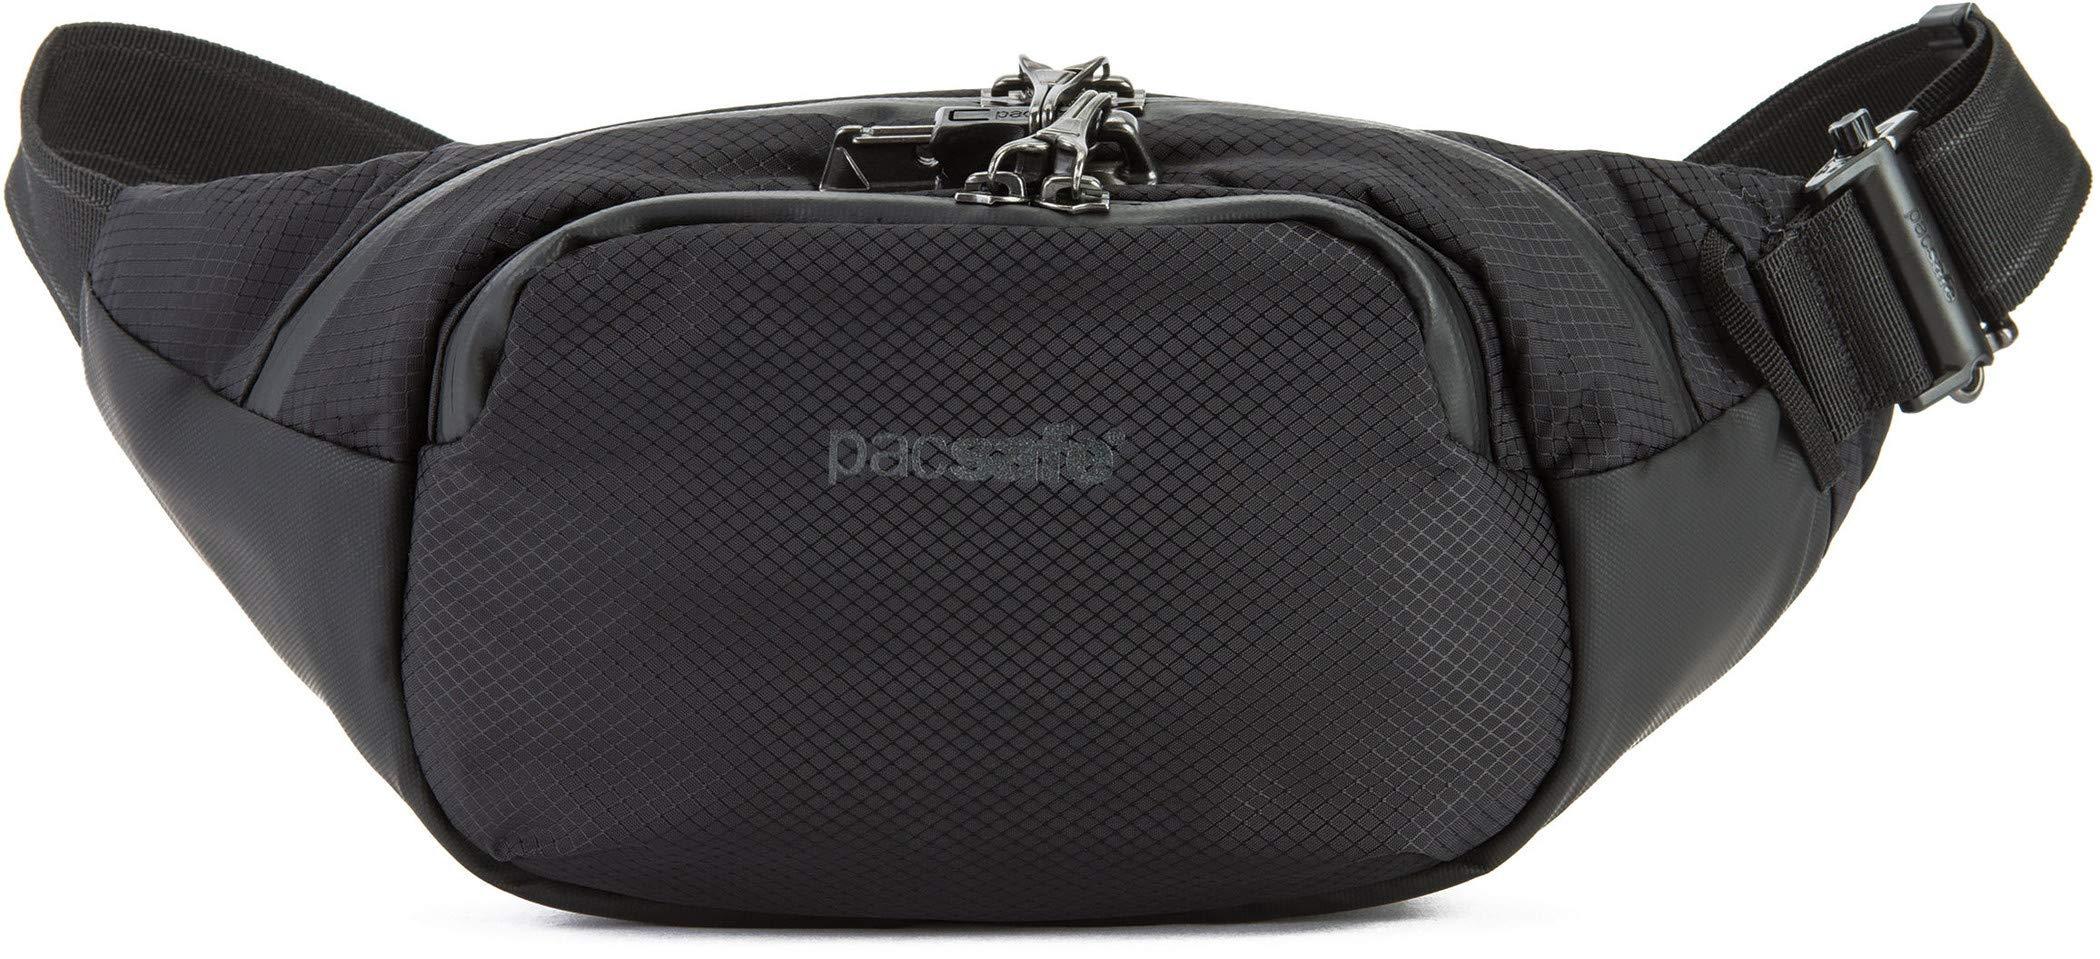 PacSafe Venturesafe X anti-theft waistpack Sport Waist Pack, 38 cm, 4 liters, Black (Black 100) by Pacsafe